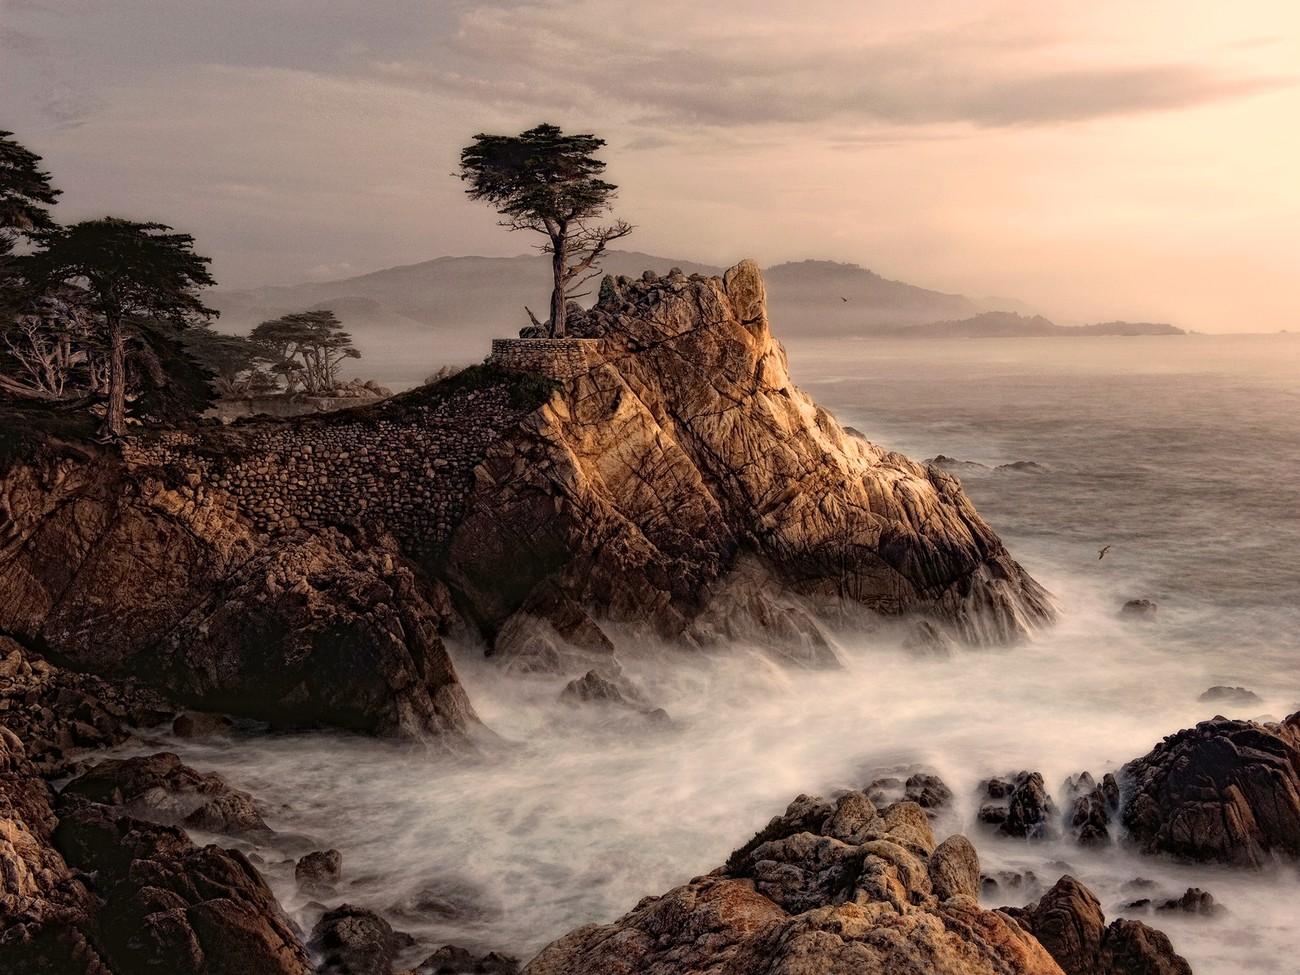 Coastal Landscapes Photo Contest Winners Announced Blog - ViewBug.com